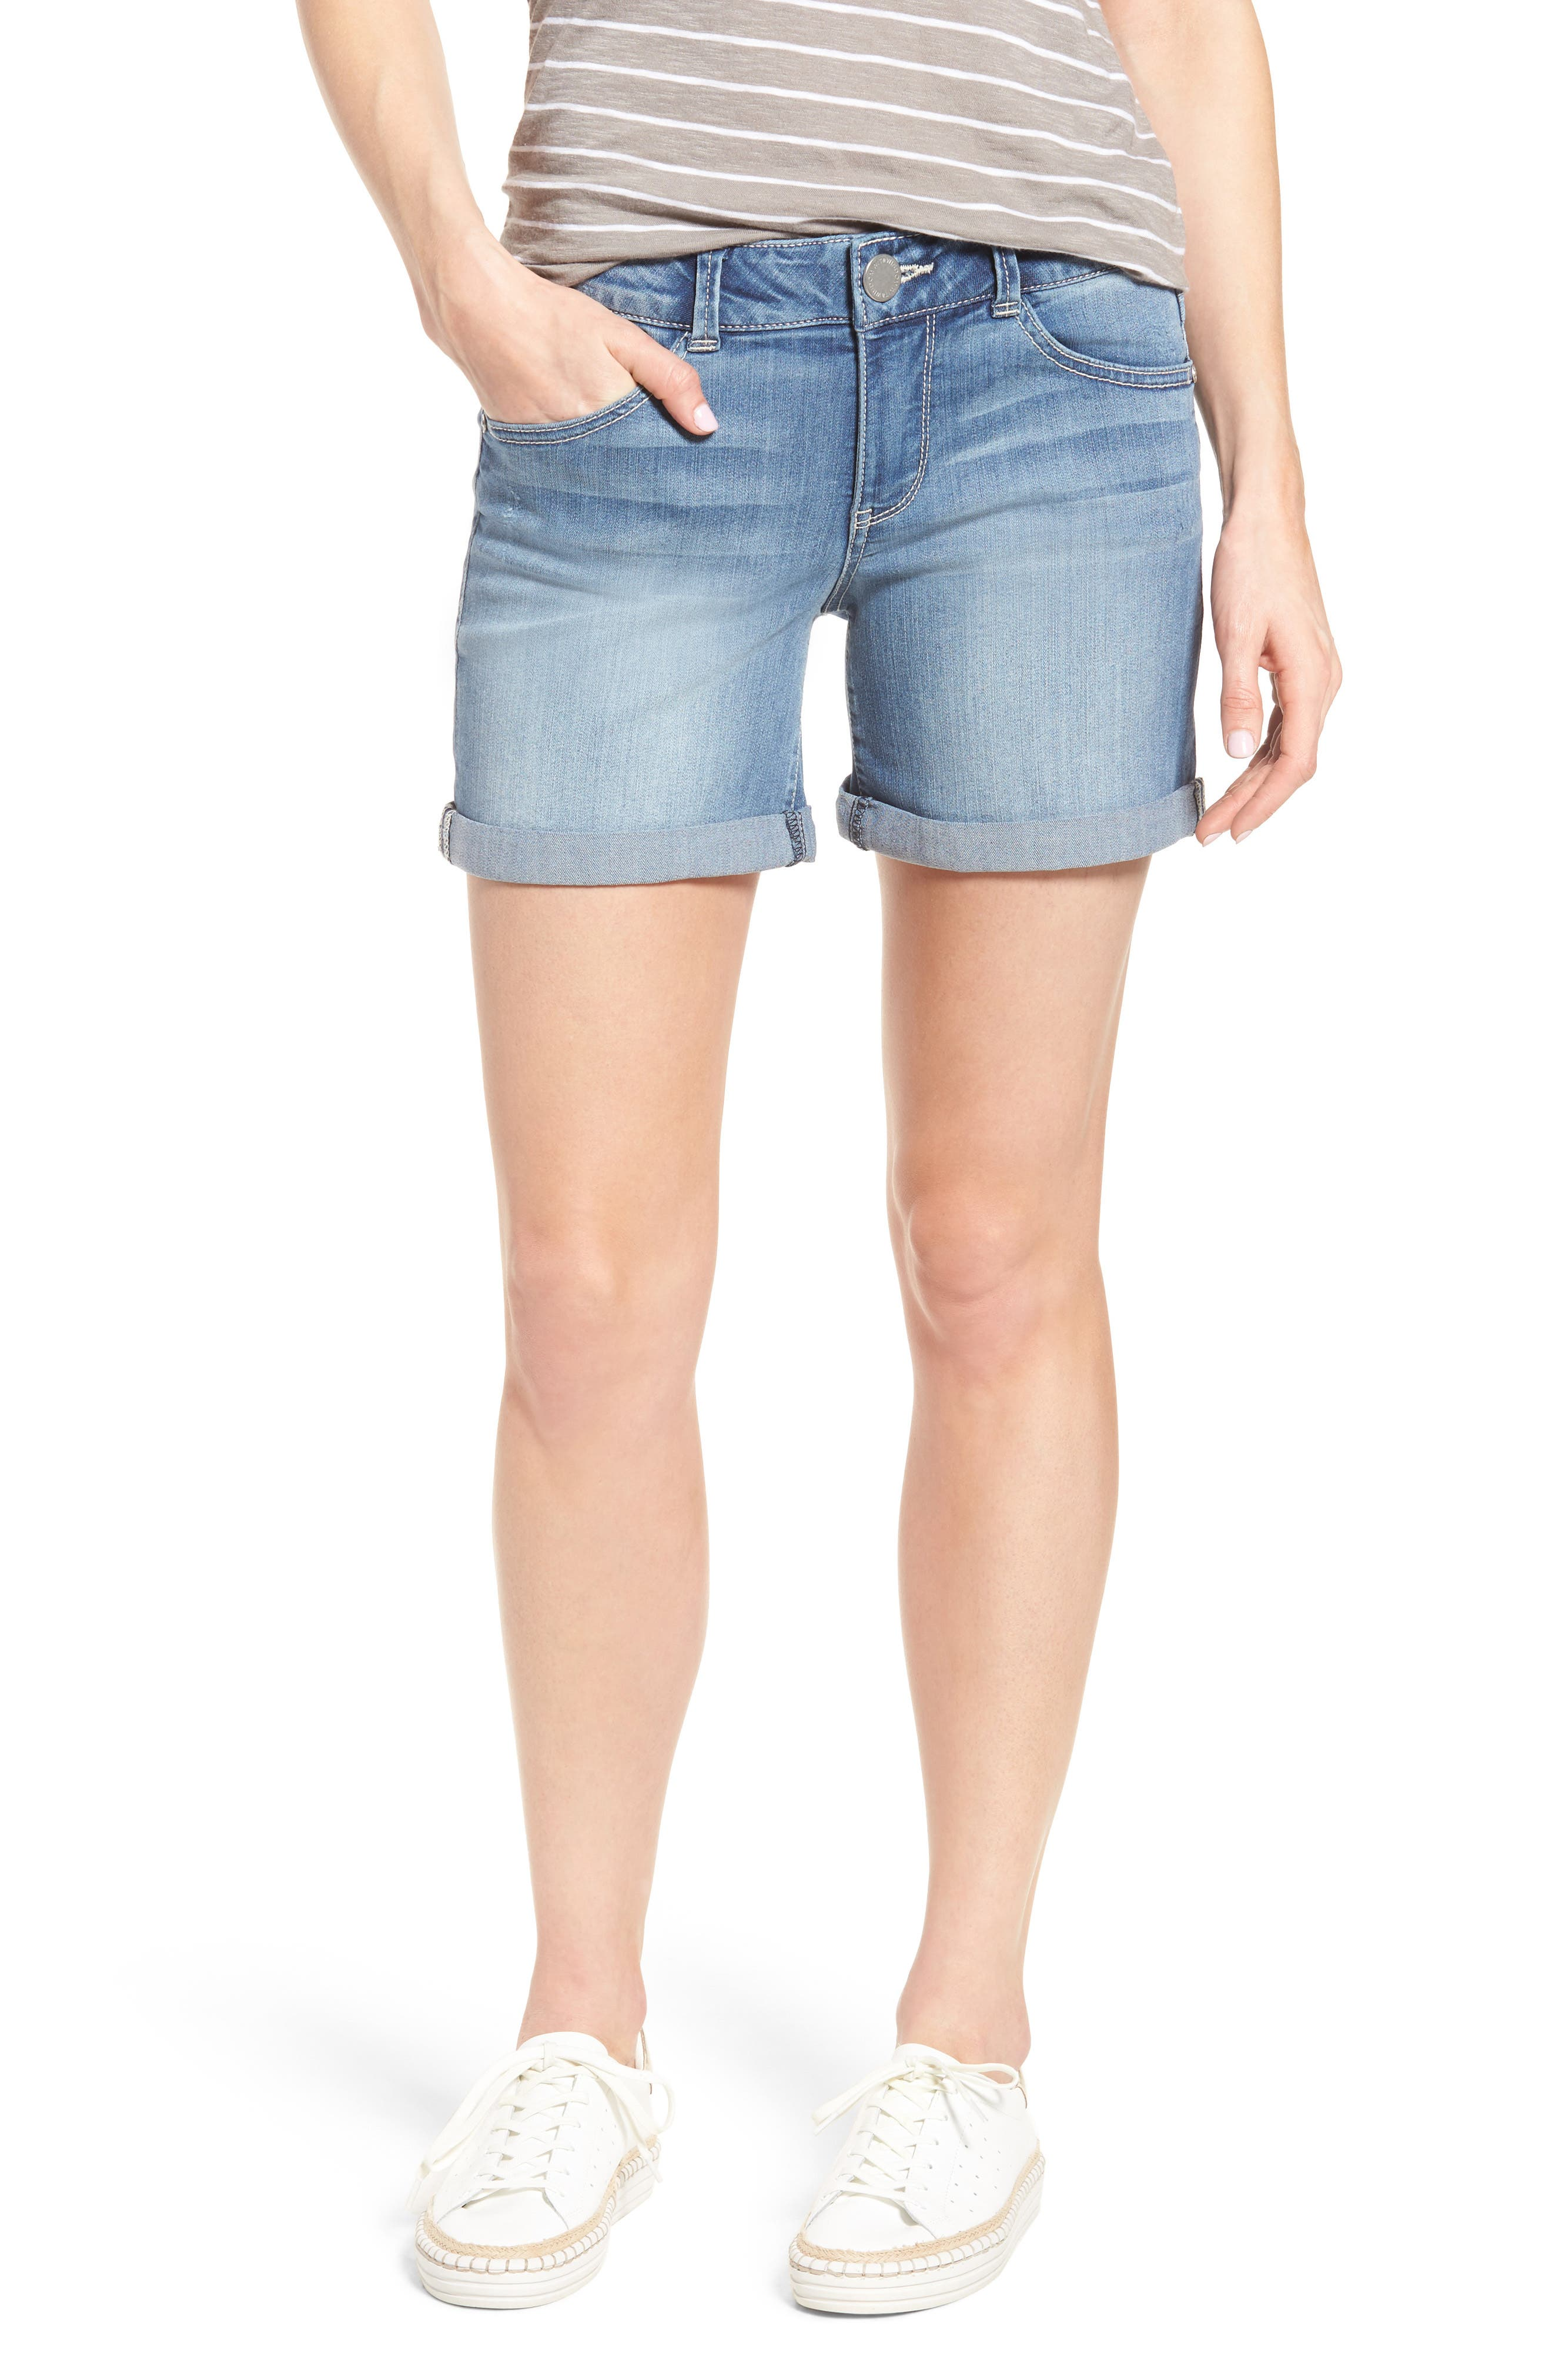 Wit & Wisdom Ab-solution Cuffed Denim Shorts (Regular & Petite) (Nordstrom Exclusive)